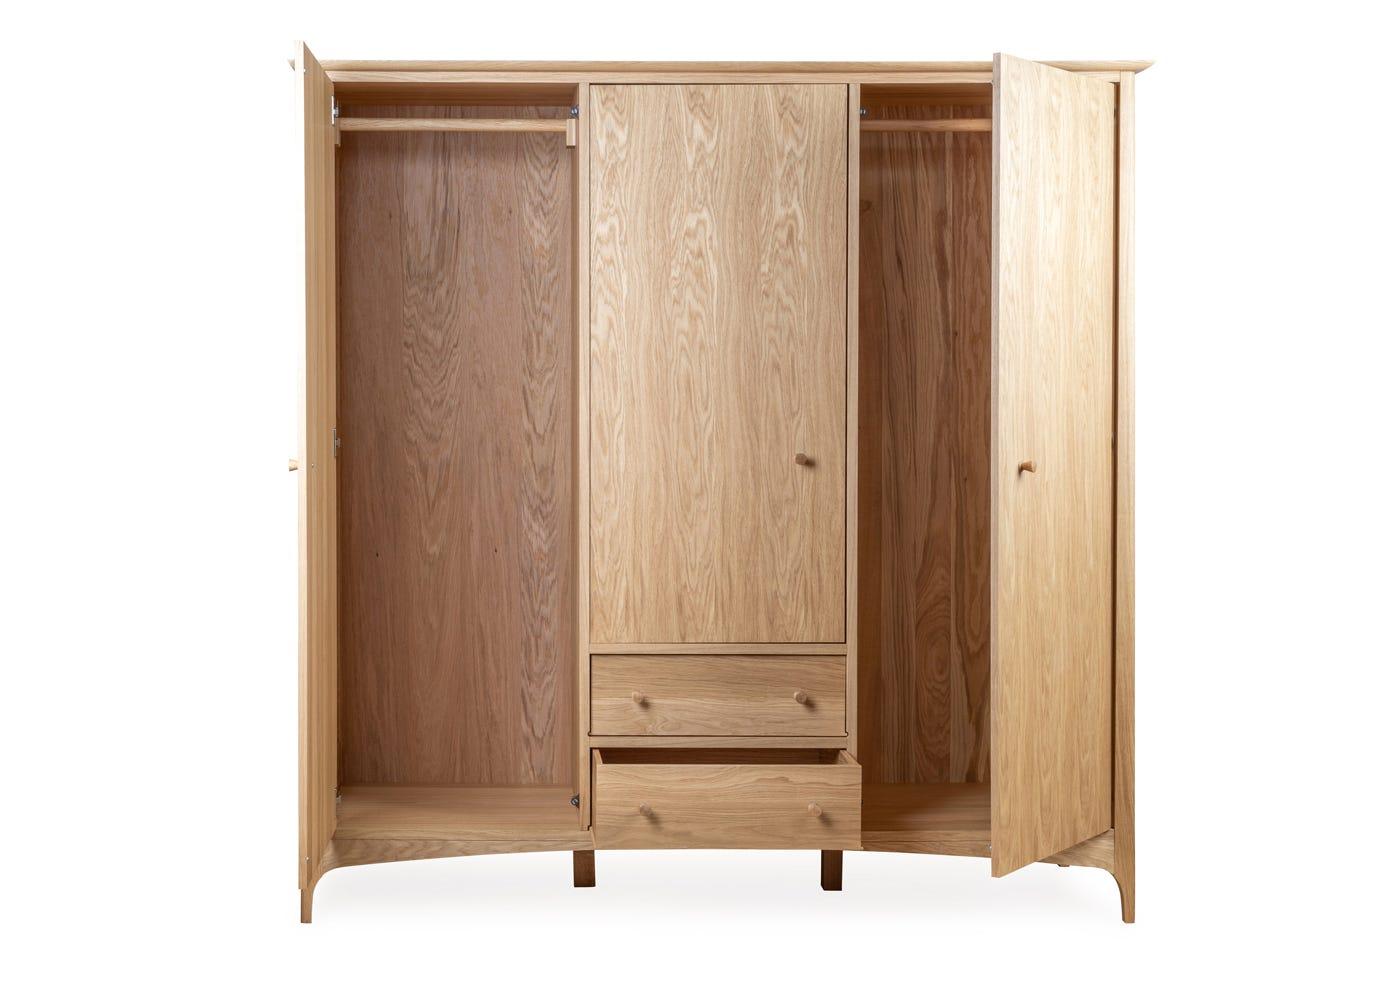 Blythe 3 door wardrobe